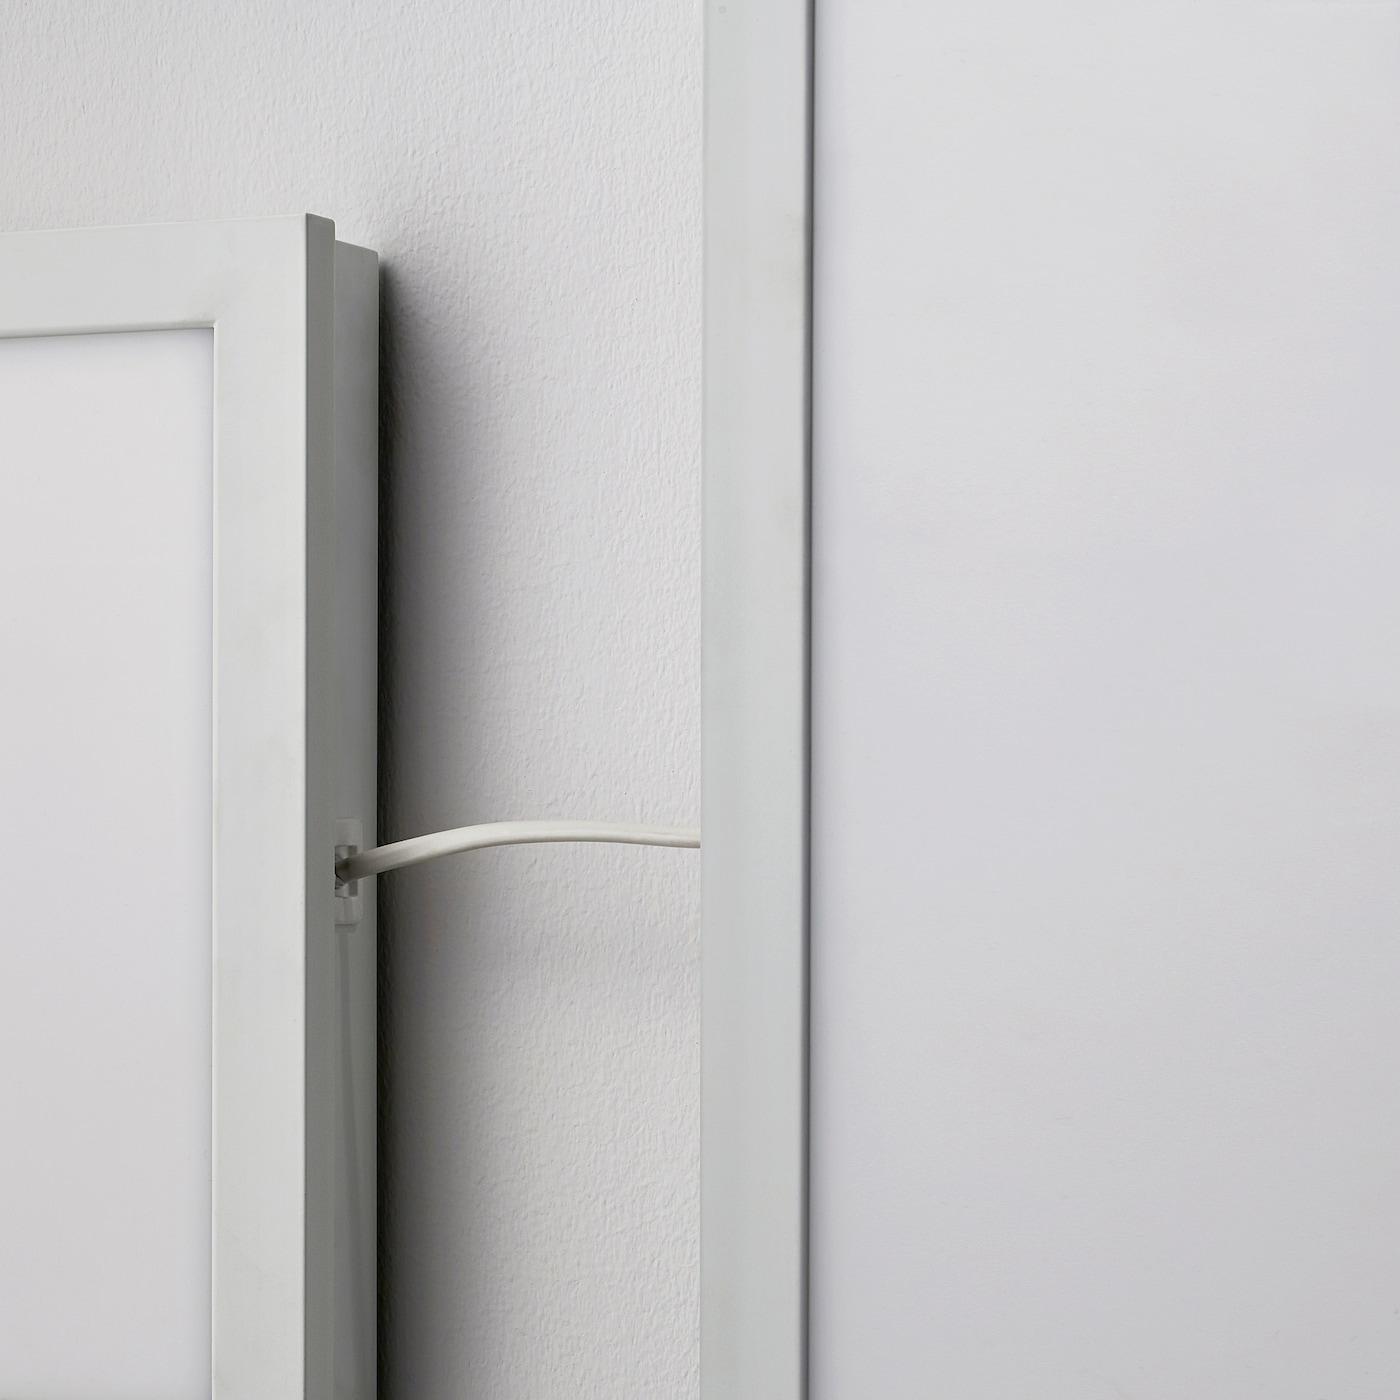 FLOALT LED ljuspanel, dimbar, vitt spektrum, 60x60 cm IKEA